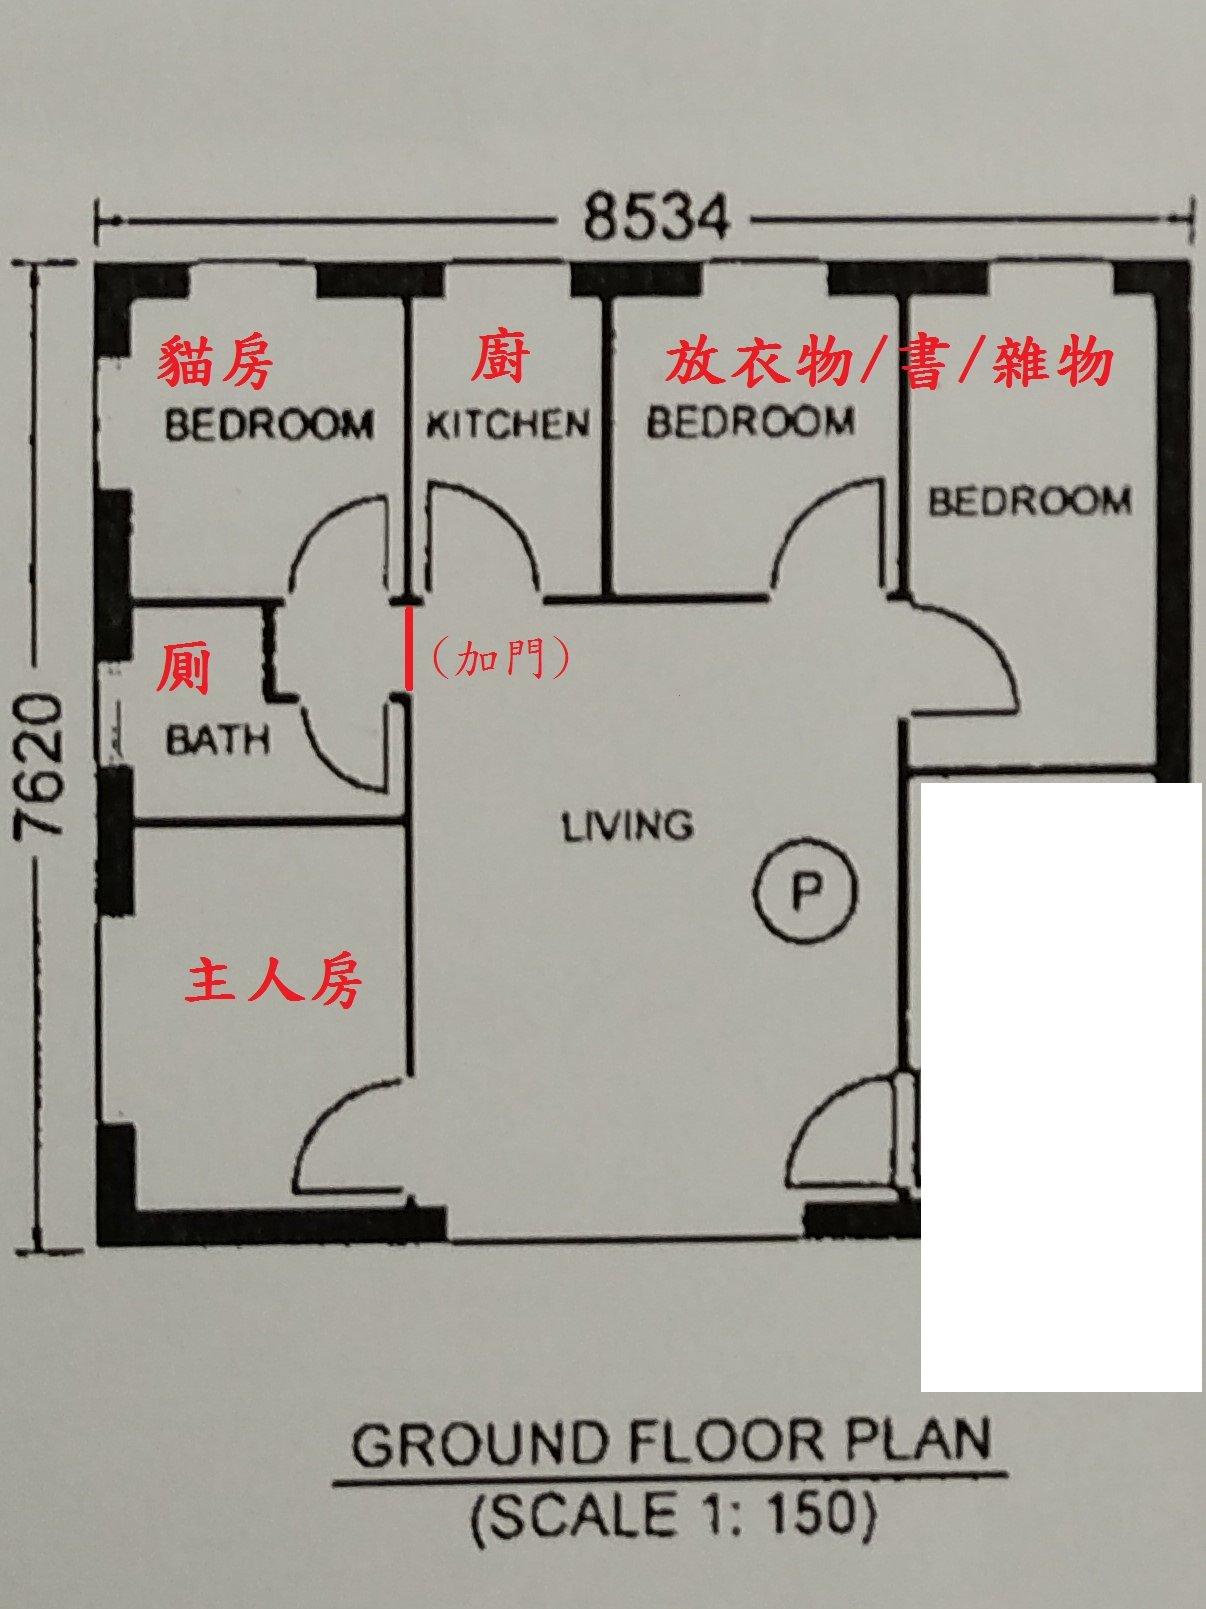 bid_deco_floorplan_1496501285.jpg